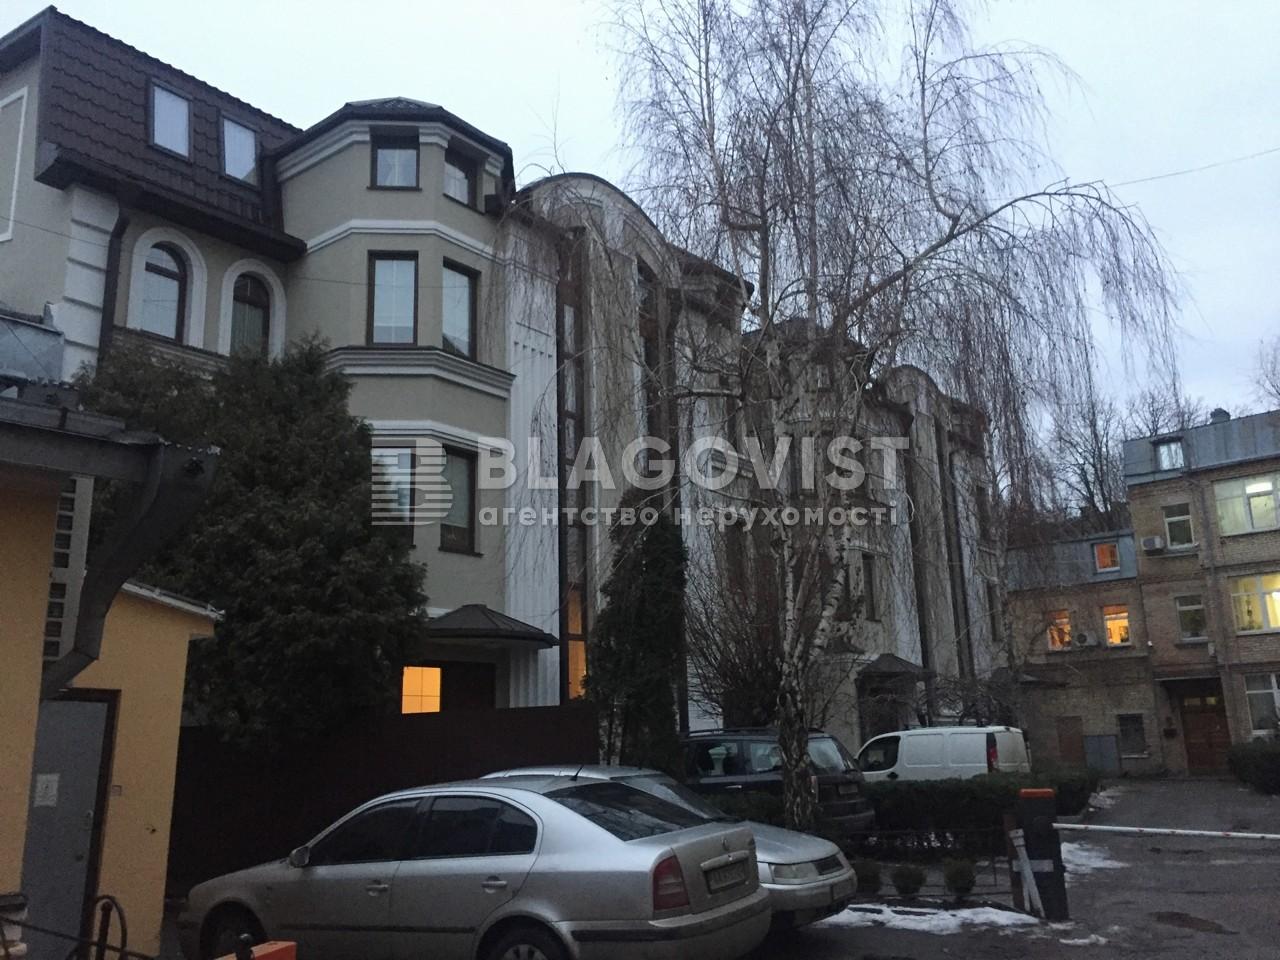 Квартира F-44834, Спасская, 10в, Киев - Фото 2